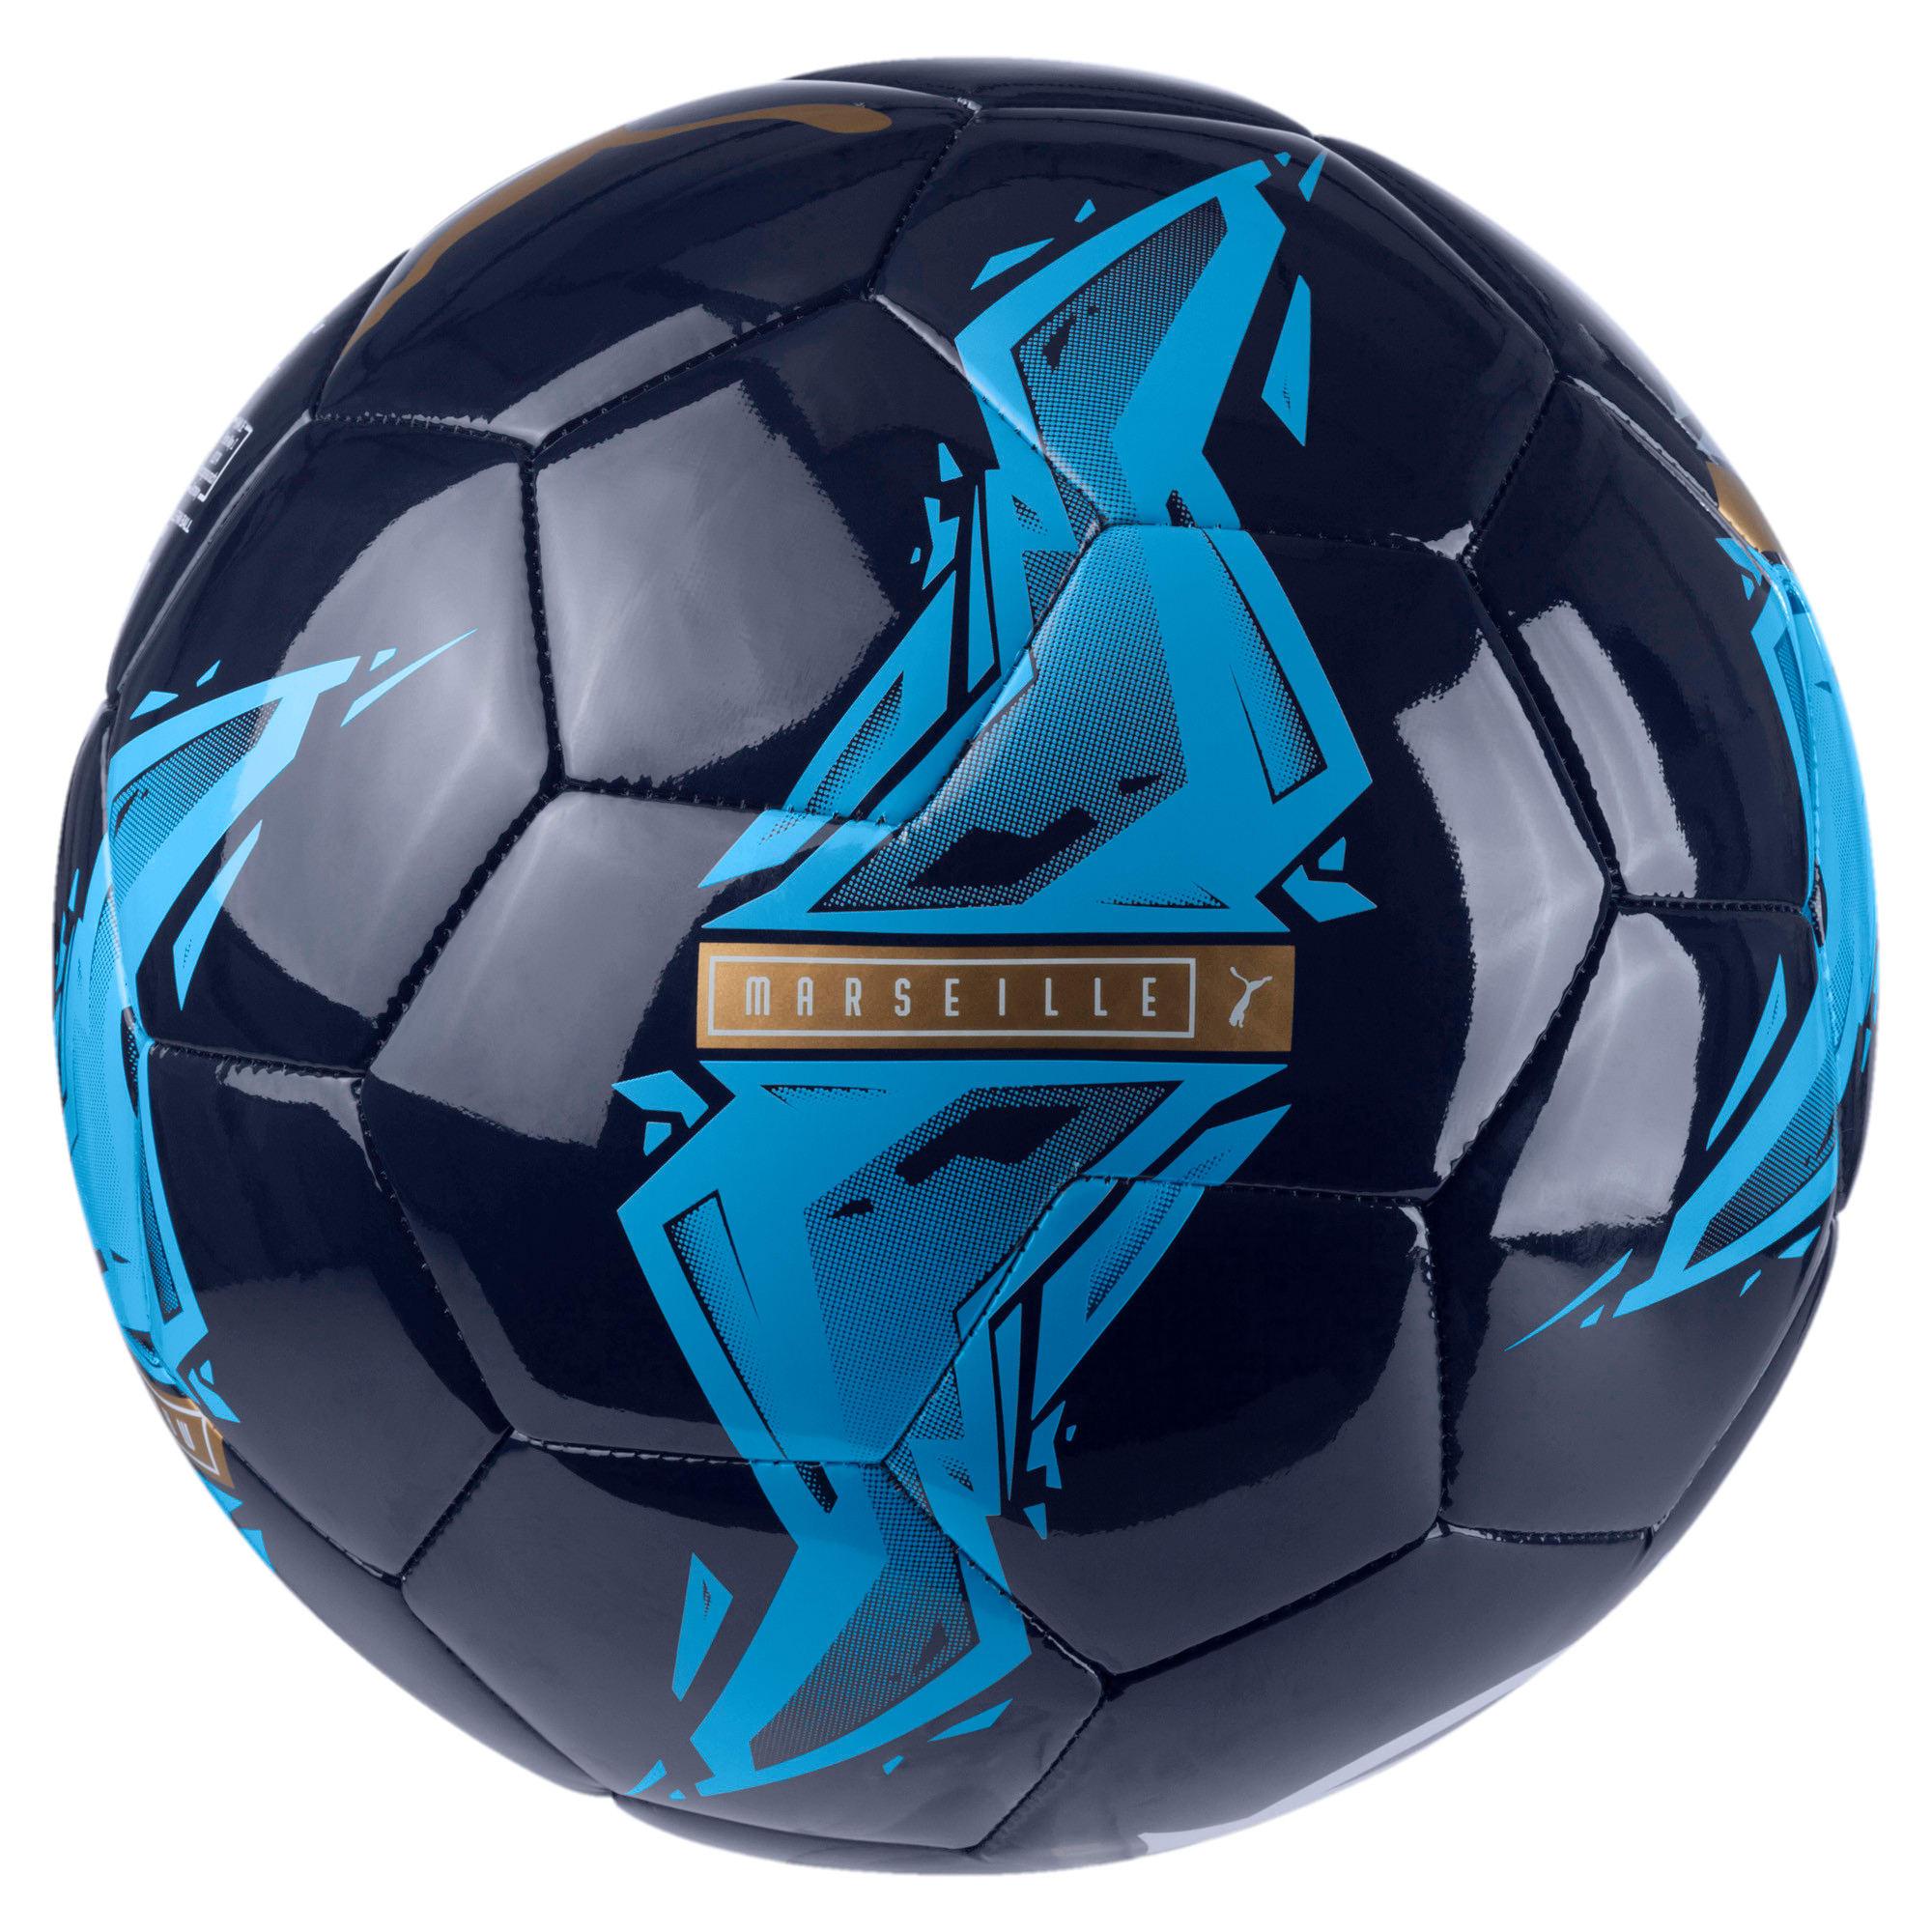 Thumbnail 2 of Olympique de Marseille Fan Ball, Peacoat-Bleu Azur, medium